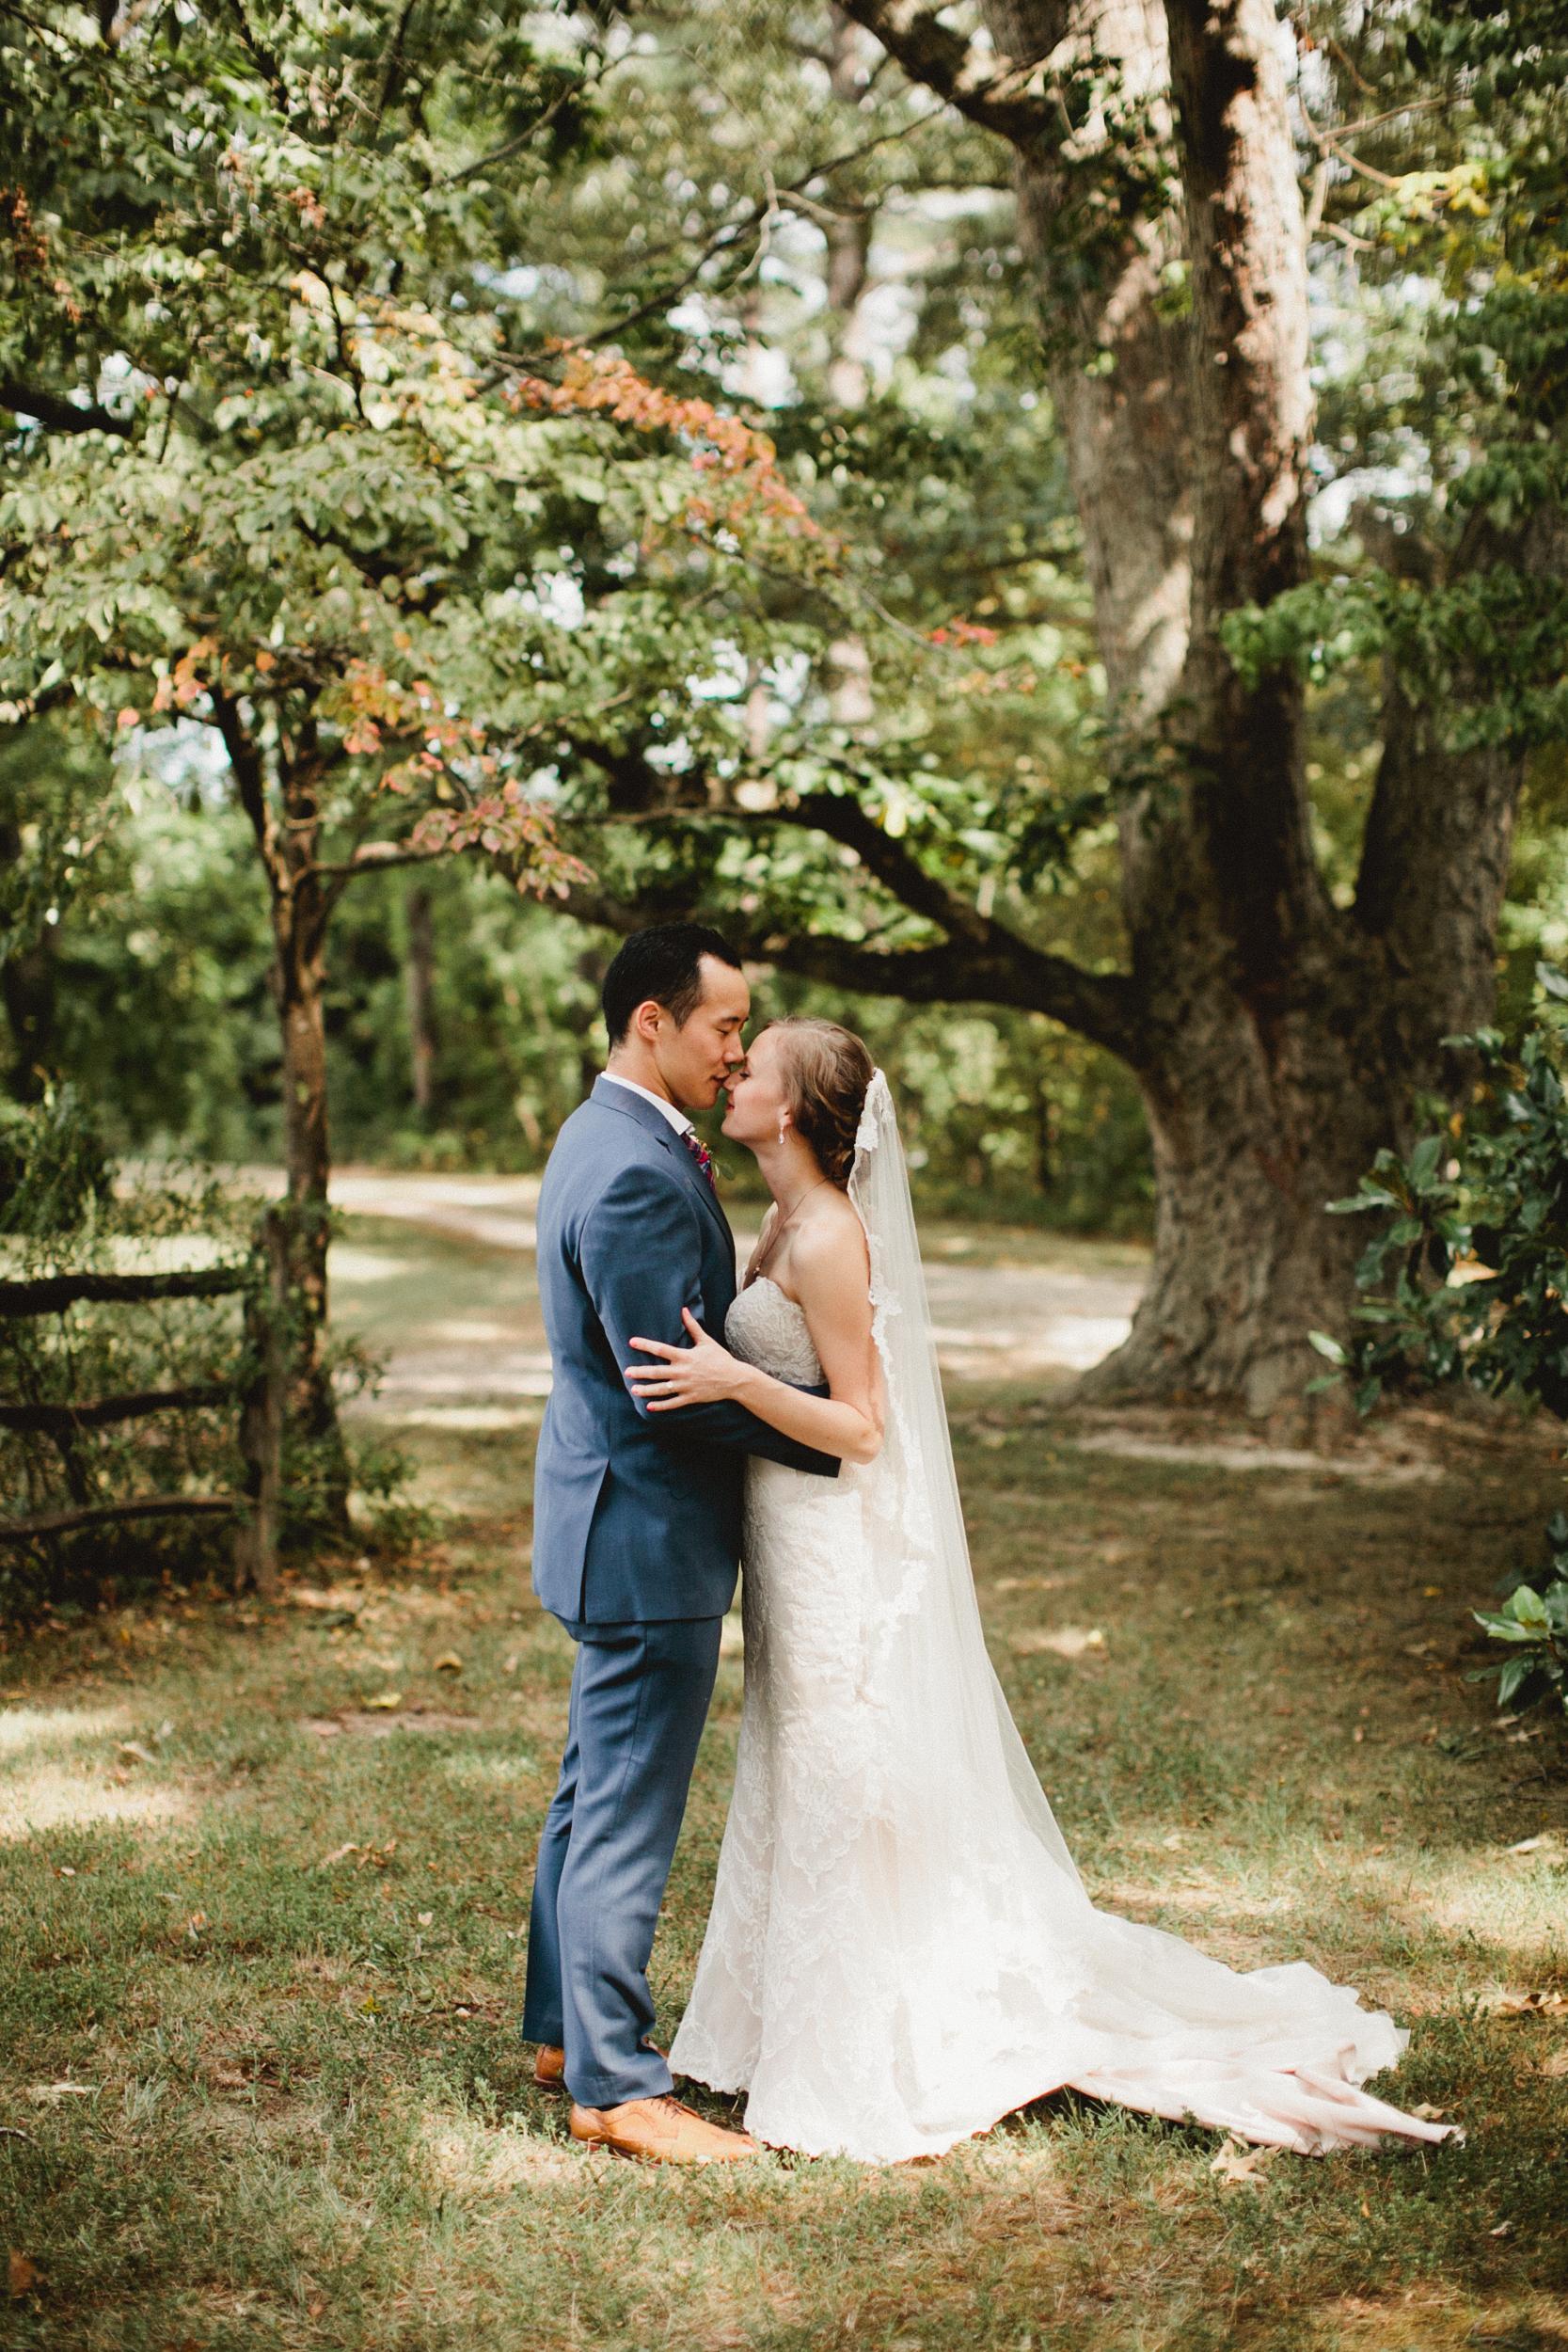 Maine-Wedding-Photographer-982.jpg